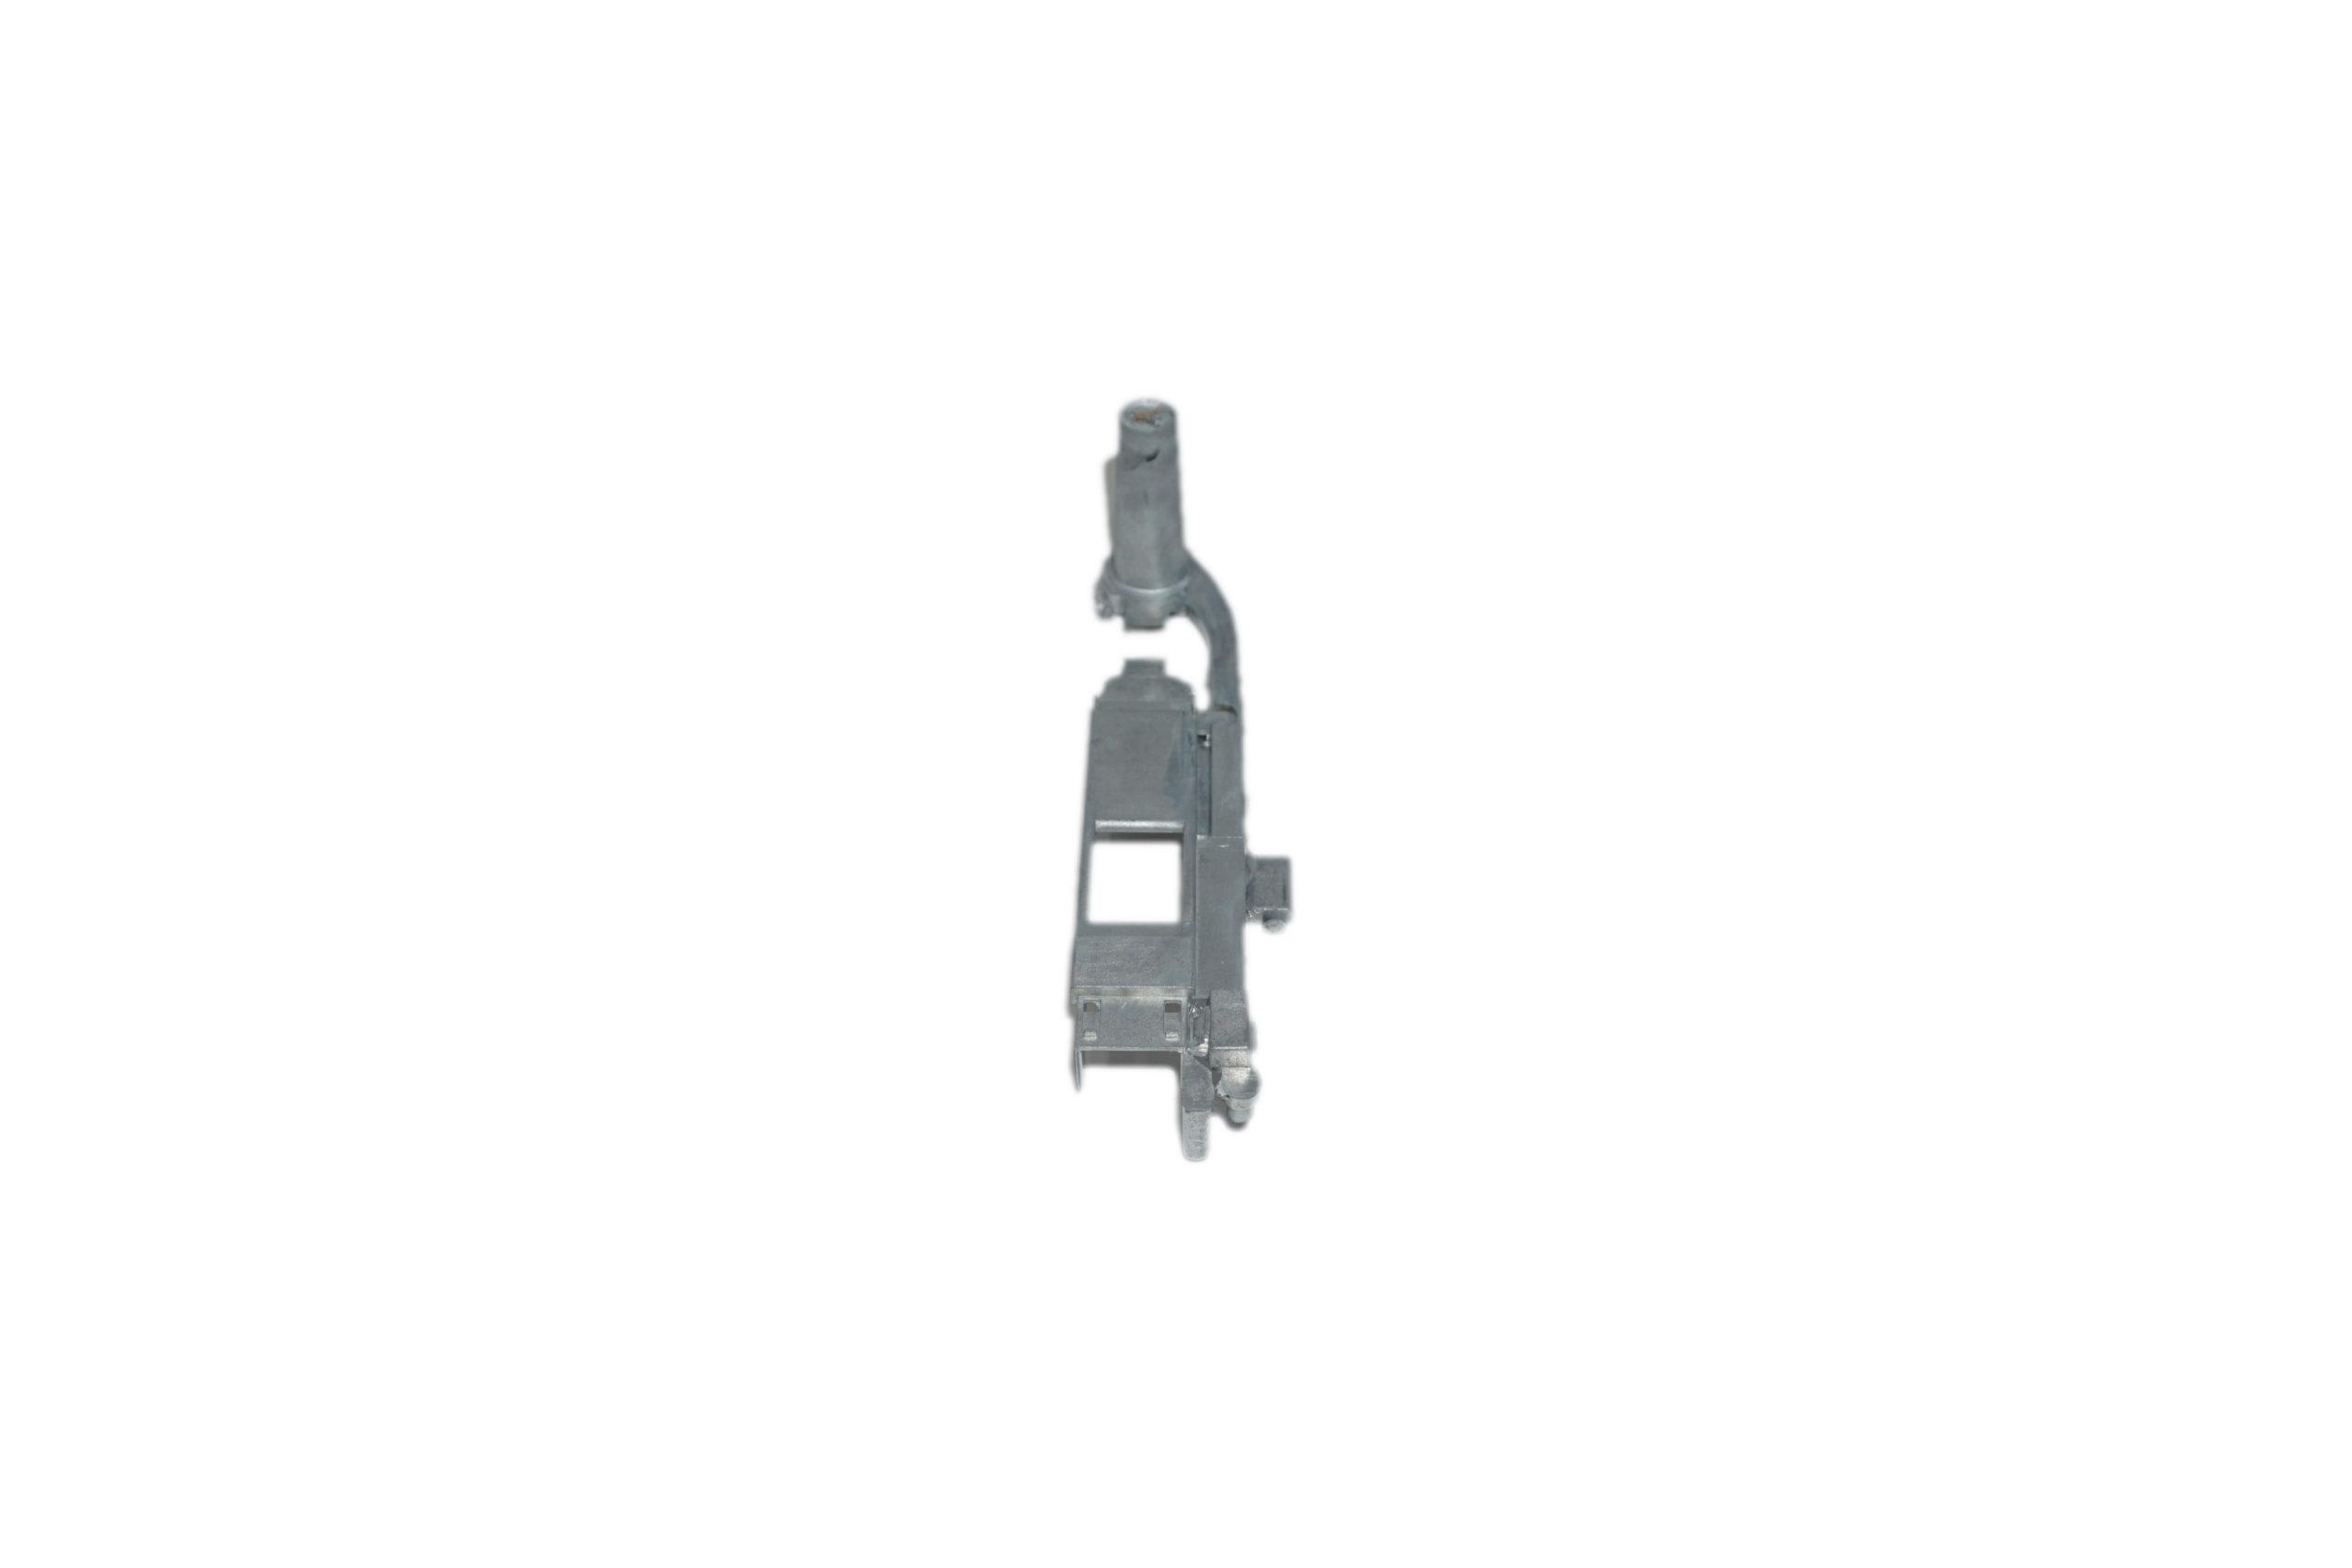 PinJack Four Slide Tooling Zinc Diecast